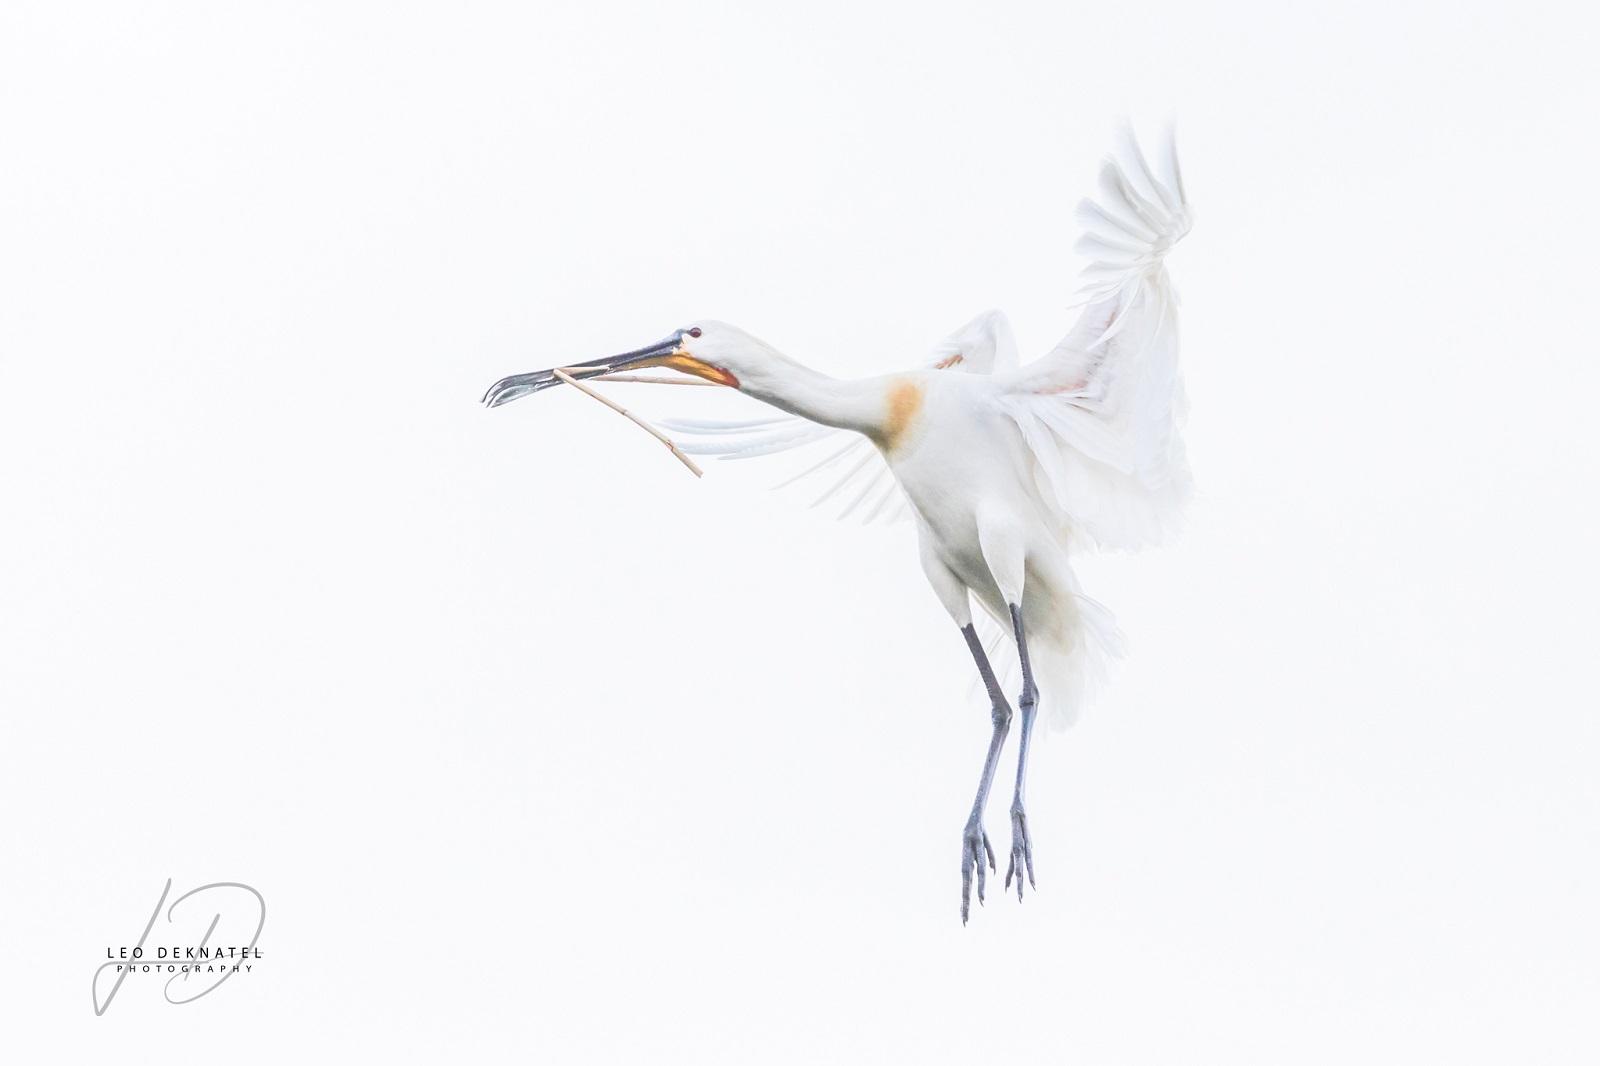 vogels-3514 L